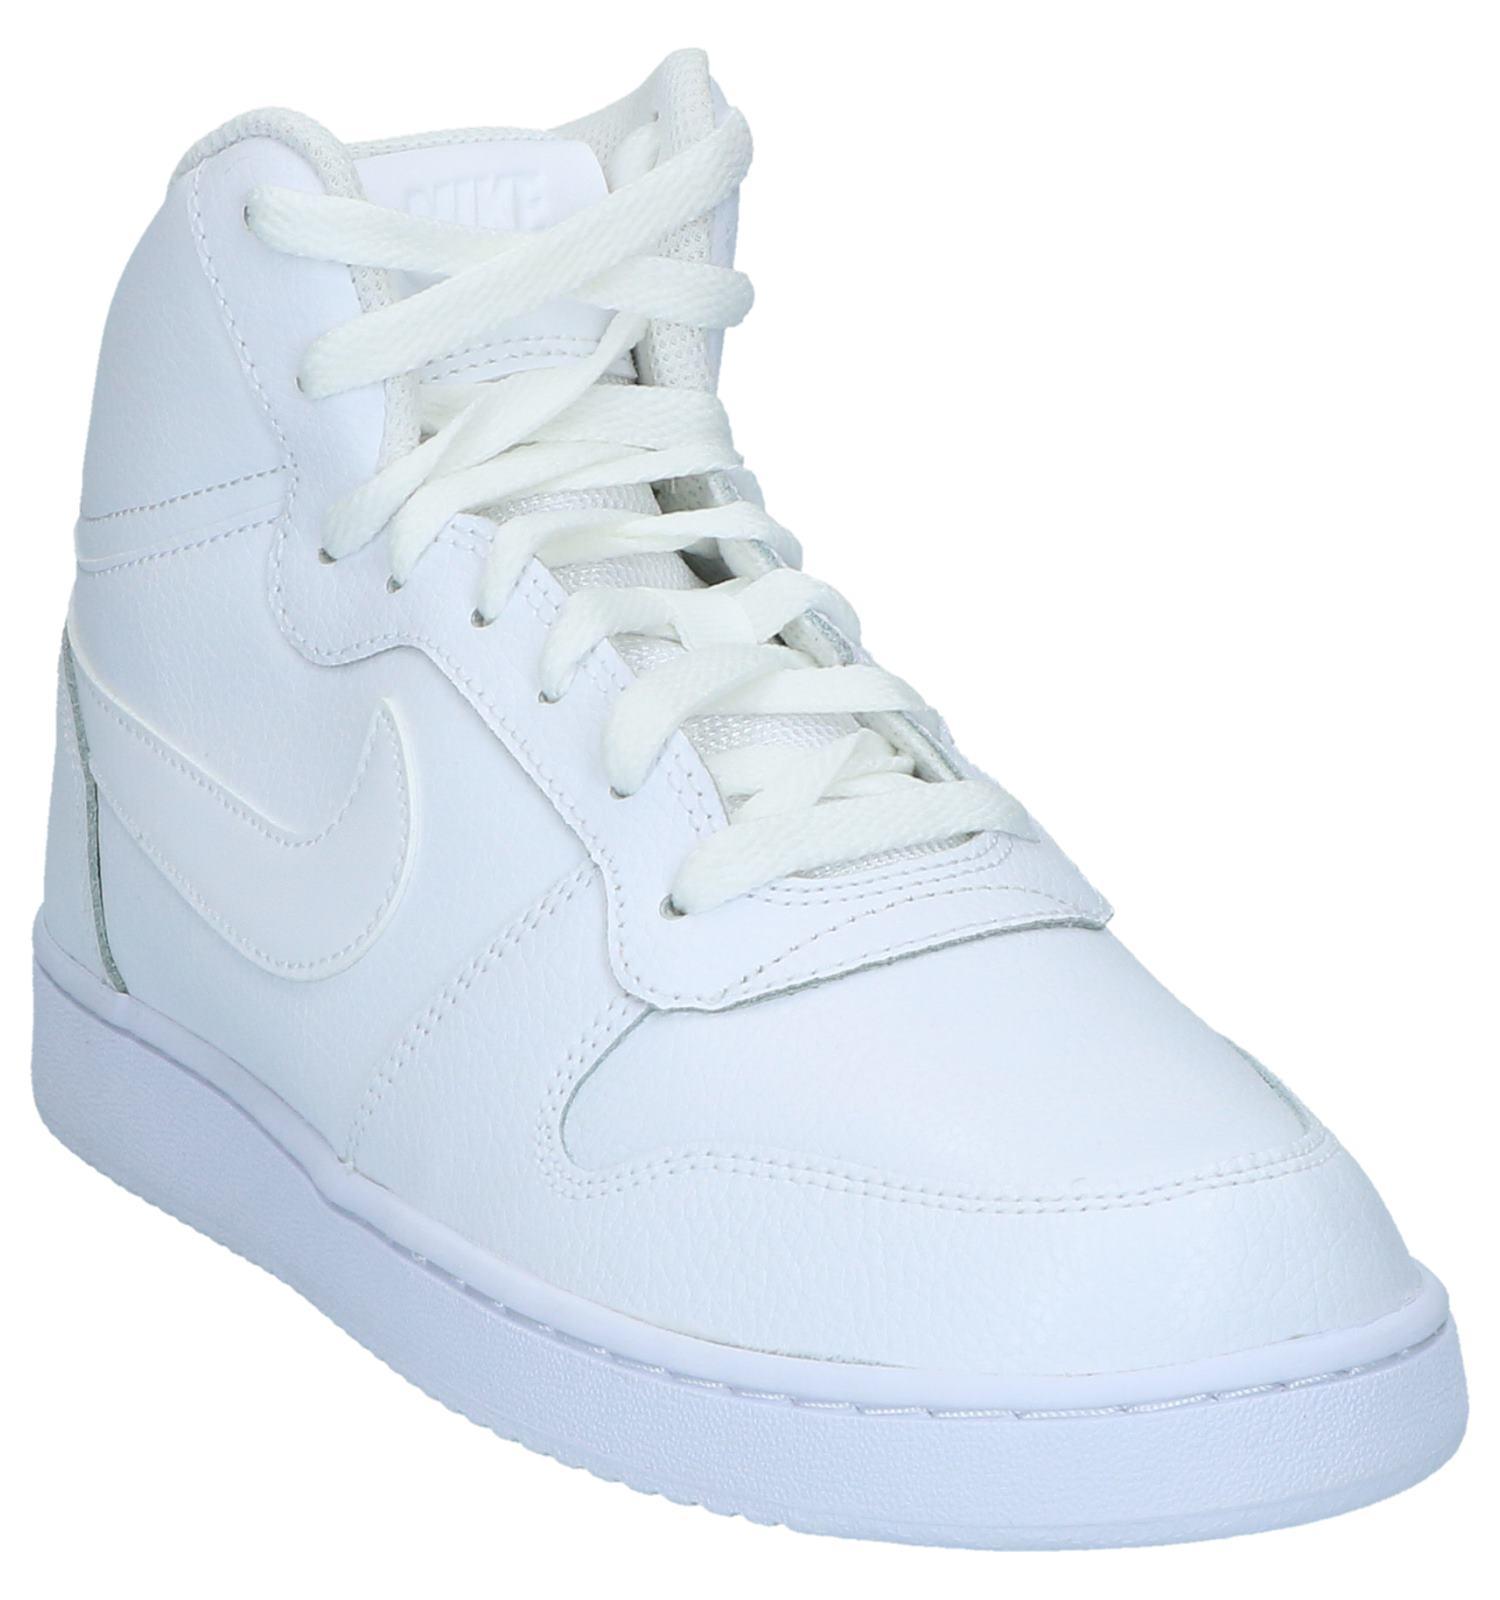 Sneakers Witte Nike Hoge be Verzend En Retour Gratis Torfs Ebernon qaxw4xp